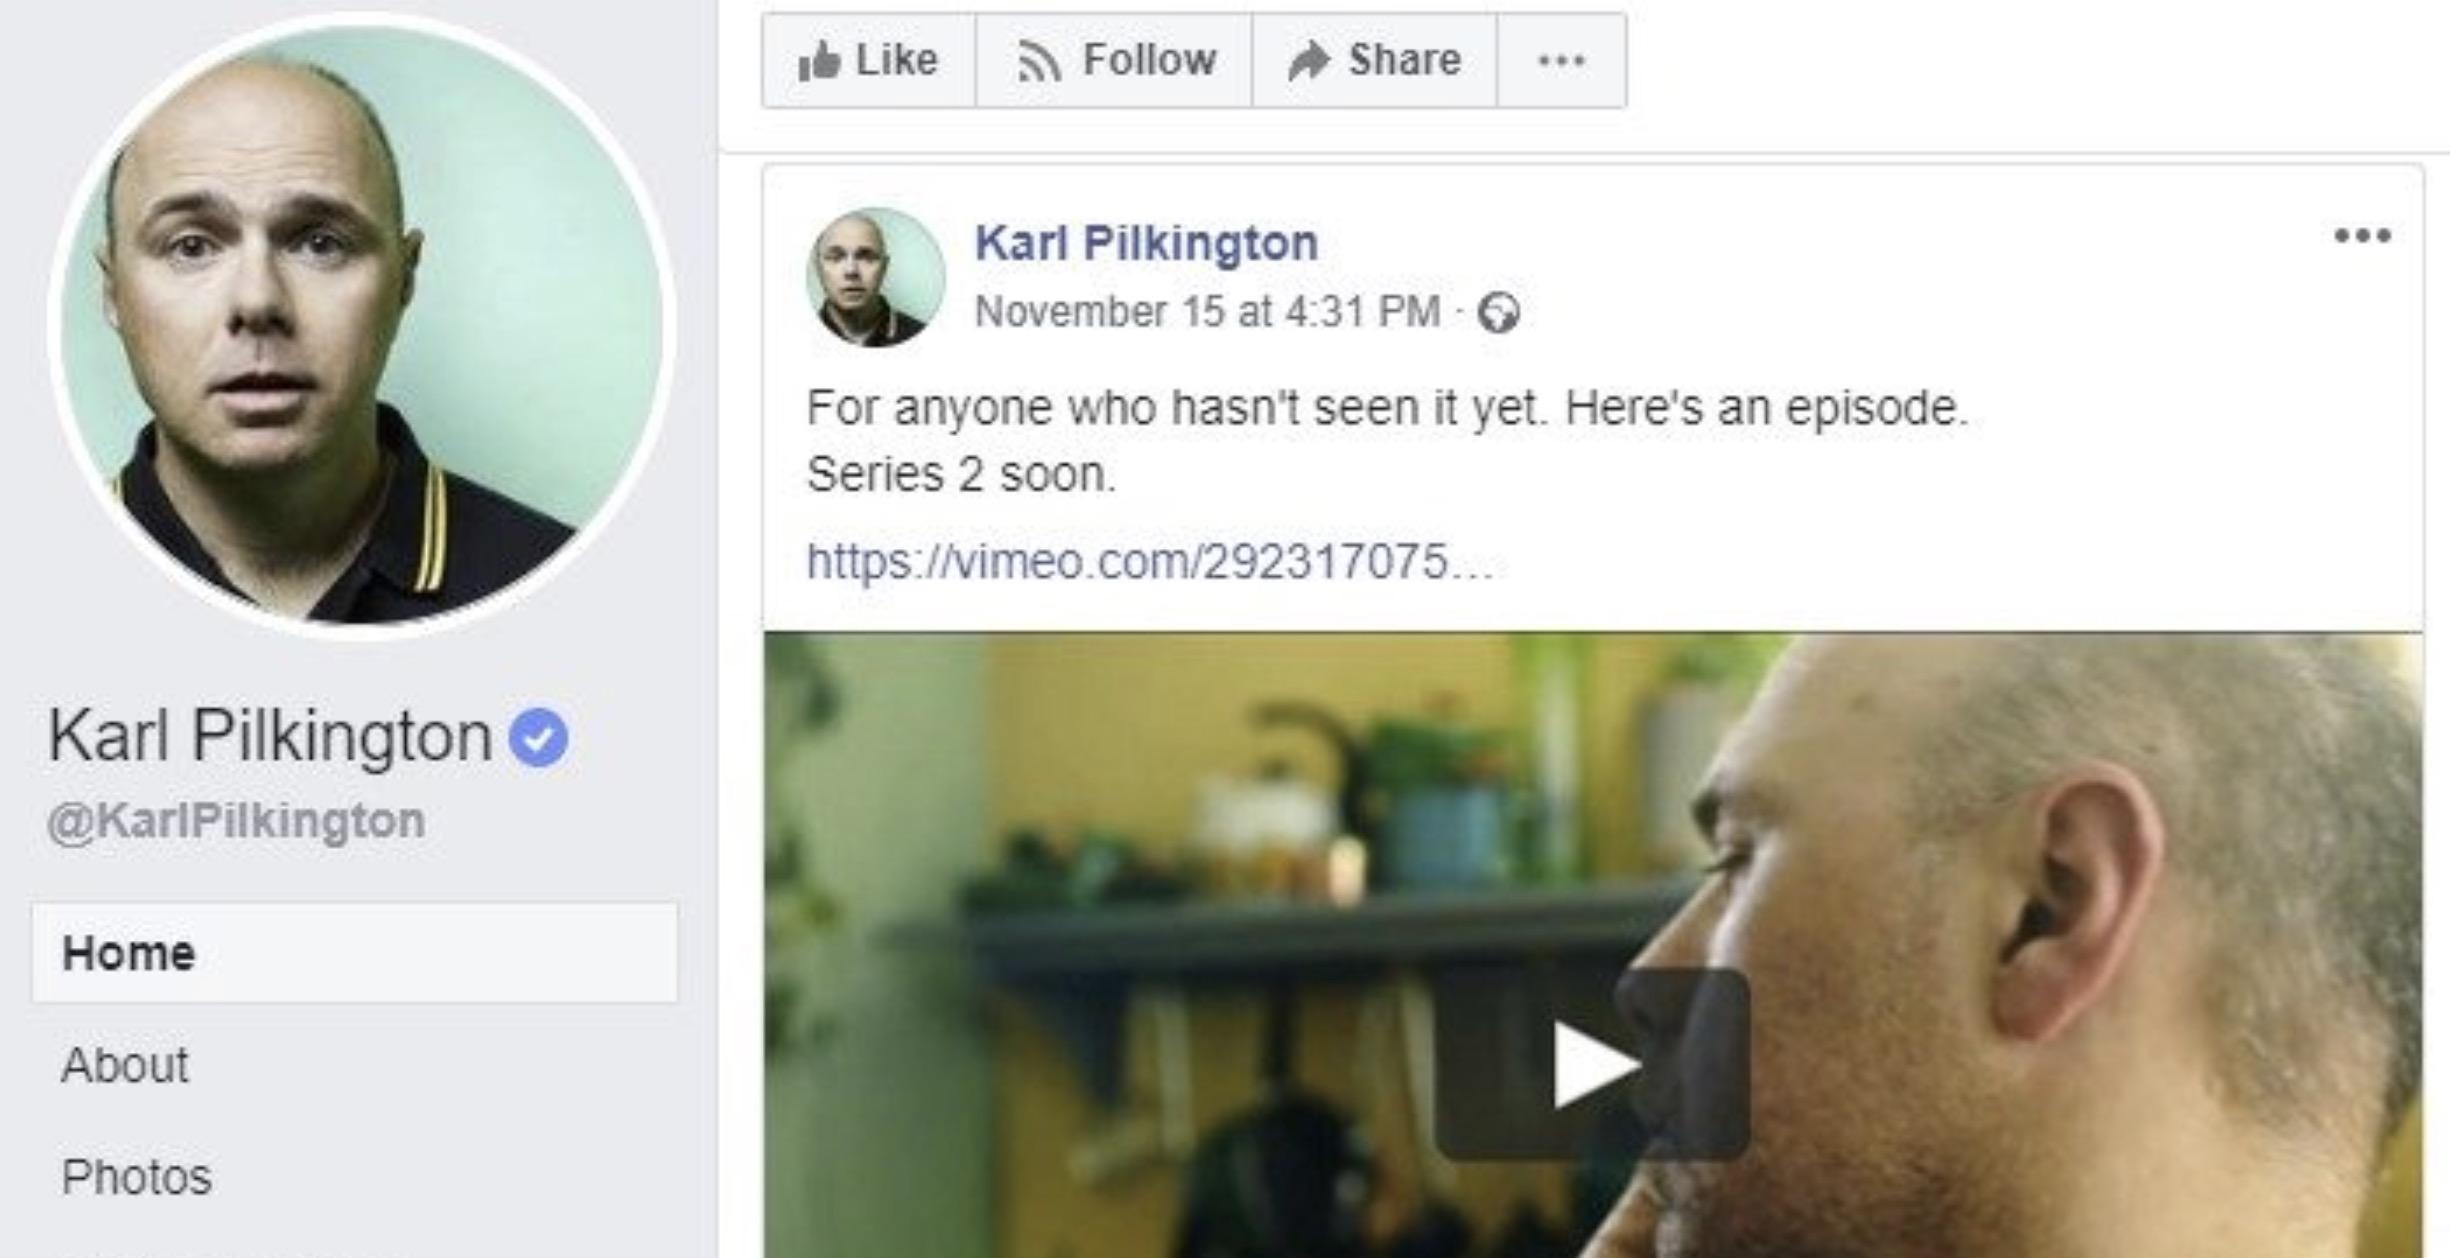 Karl Pilkington Facebook